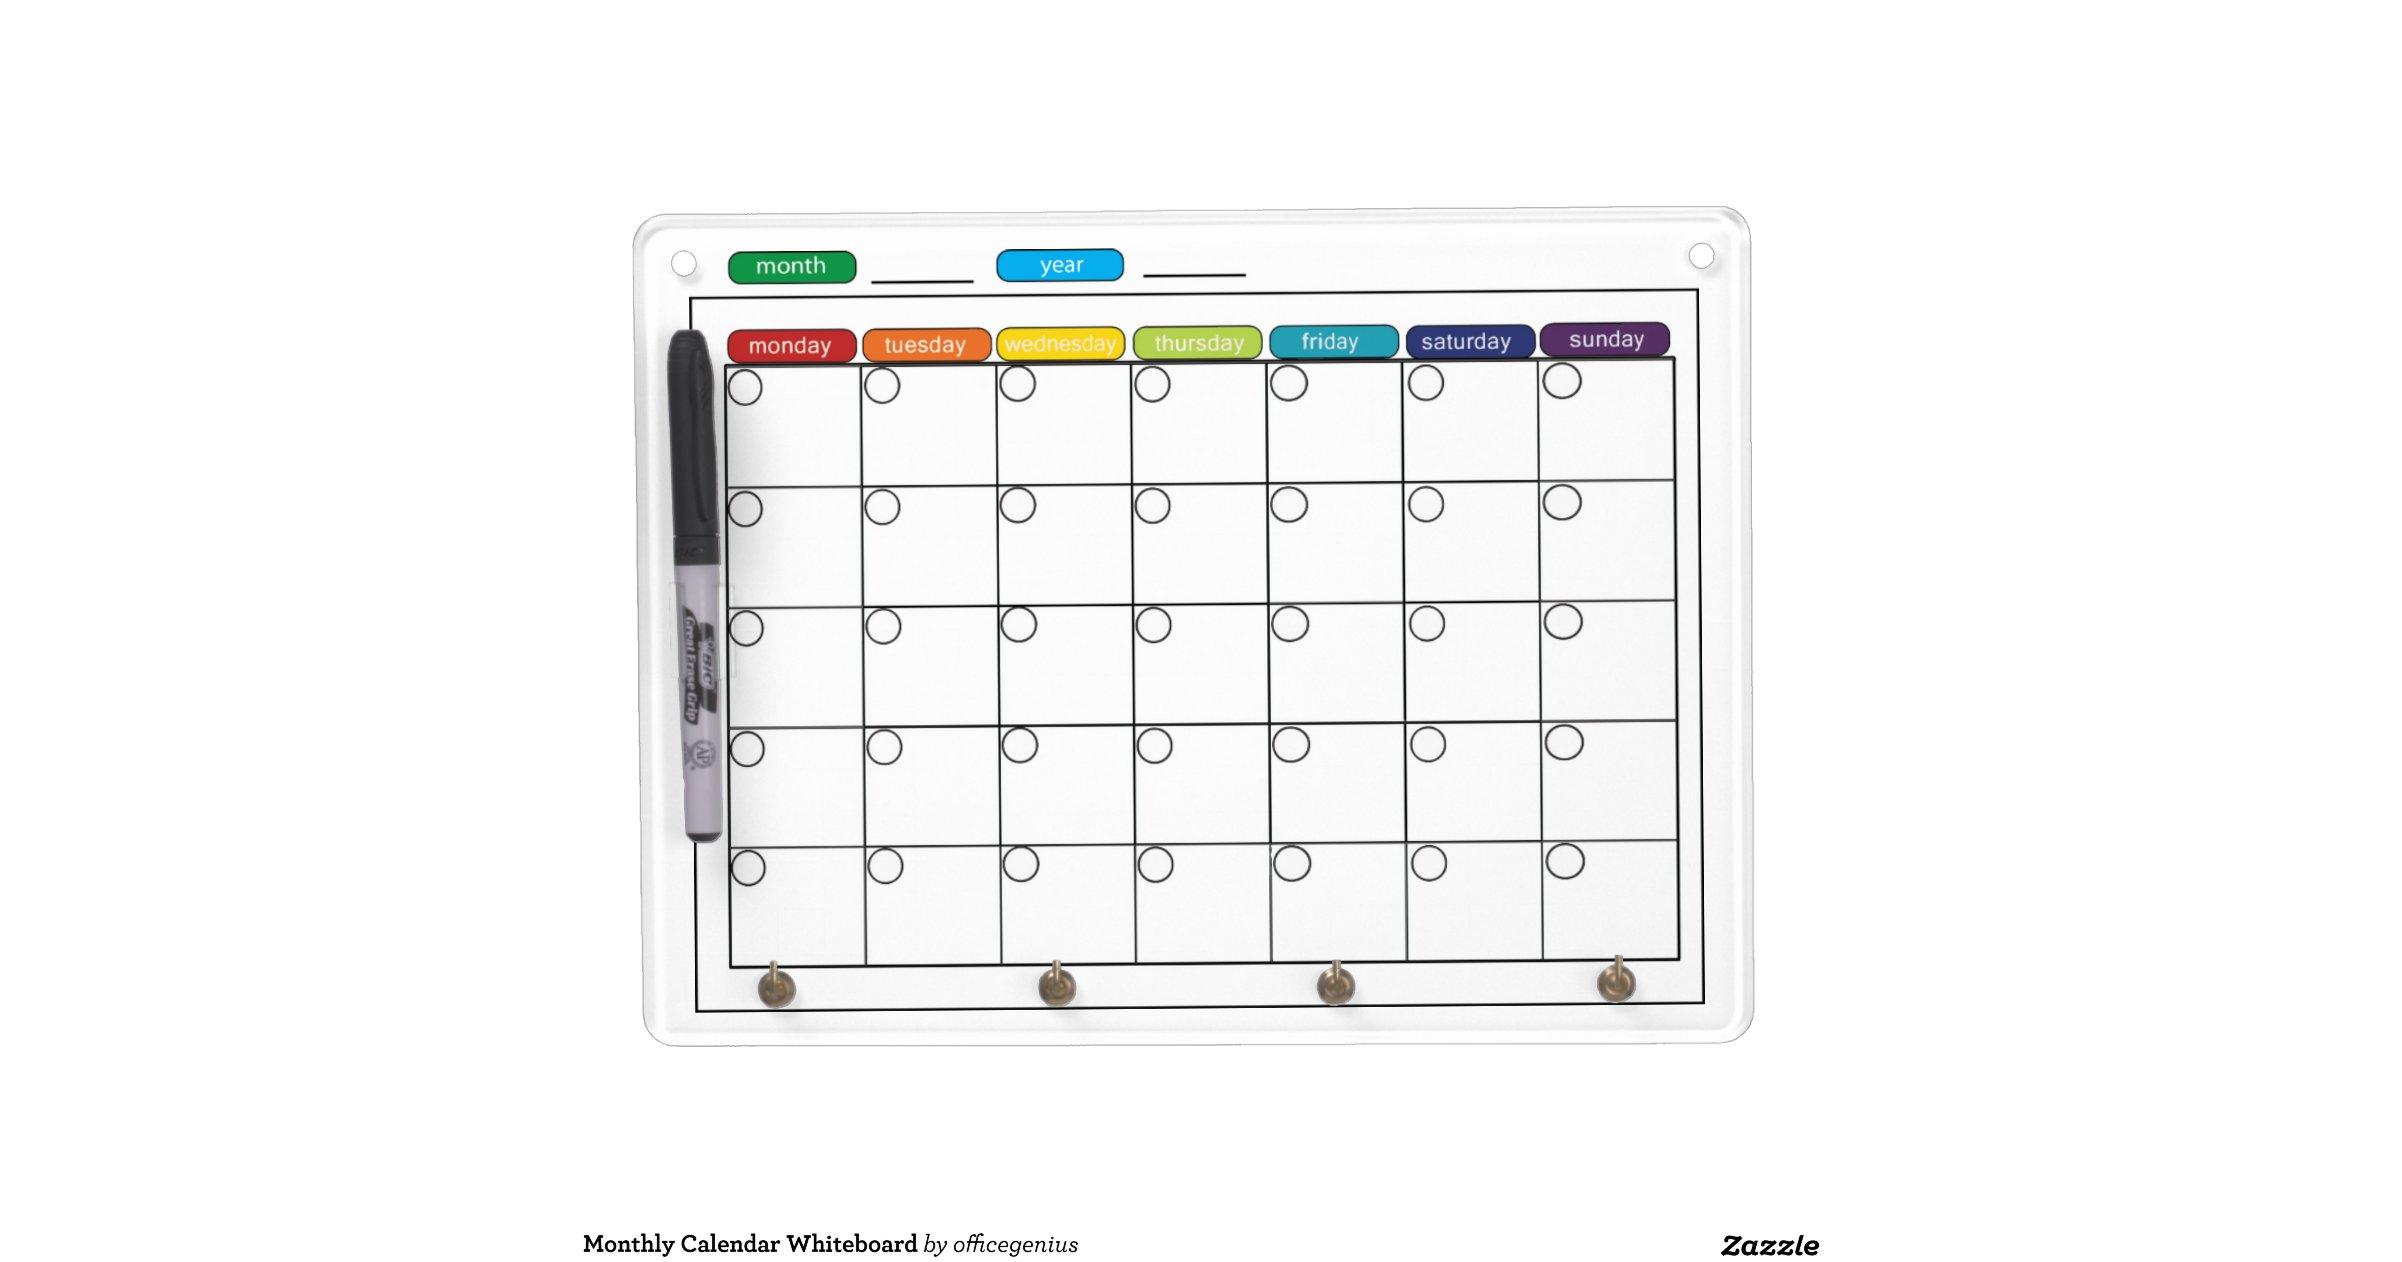 Dry Erase Weekly Calendar Board : Monthly calendar whiteboard dry erase boards zazzle